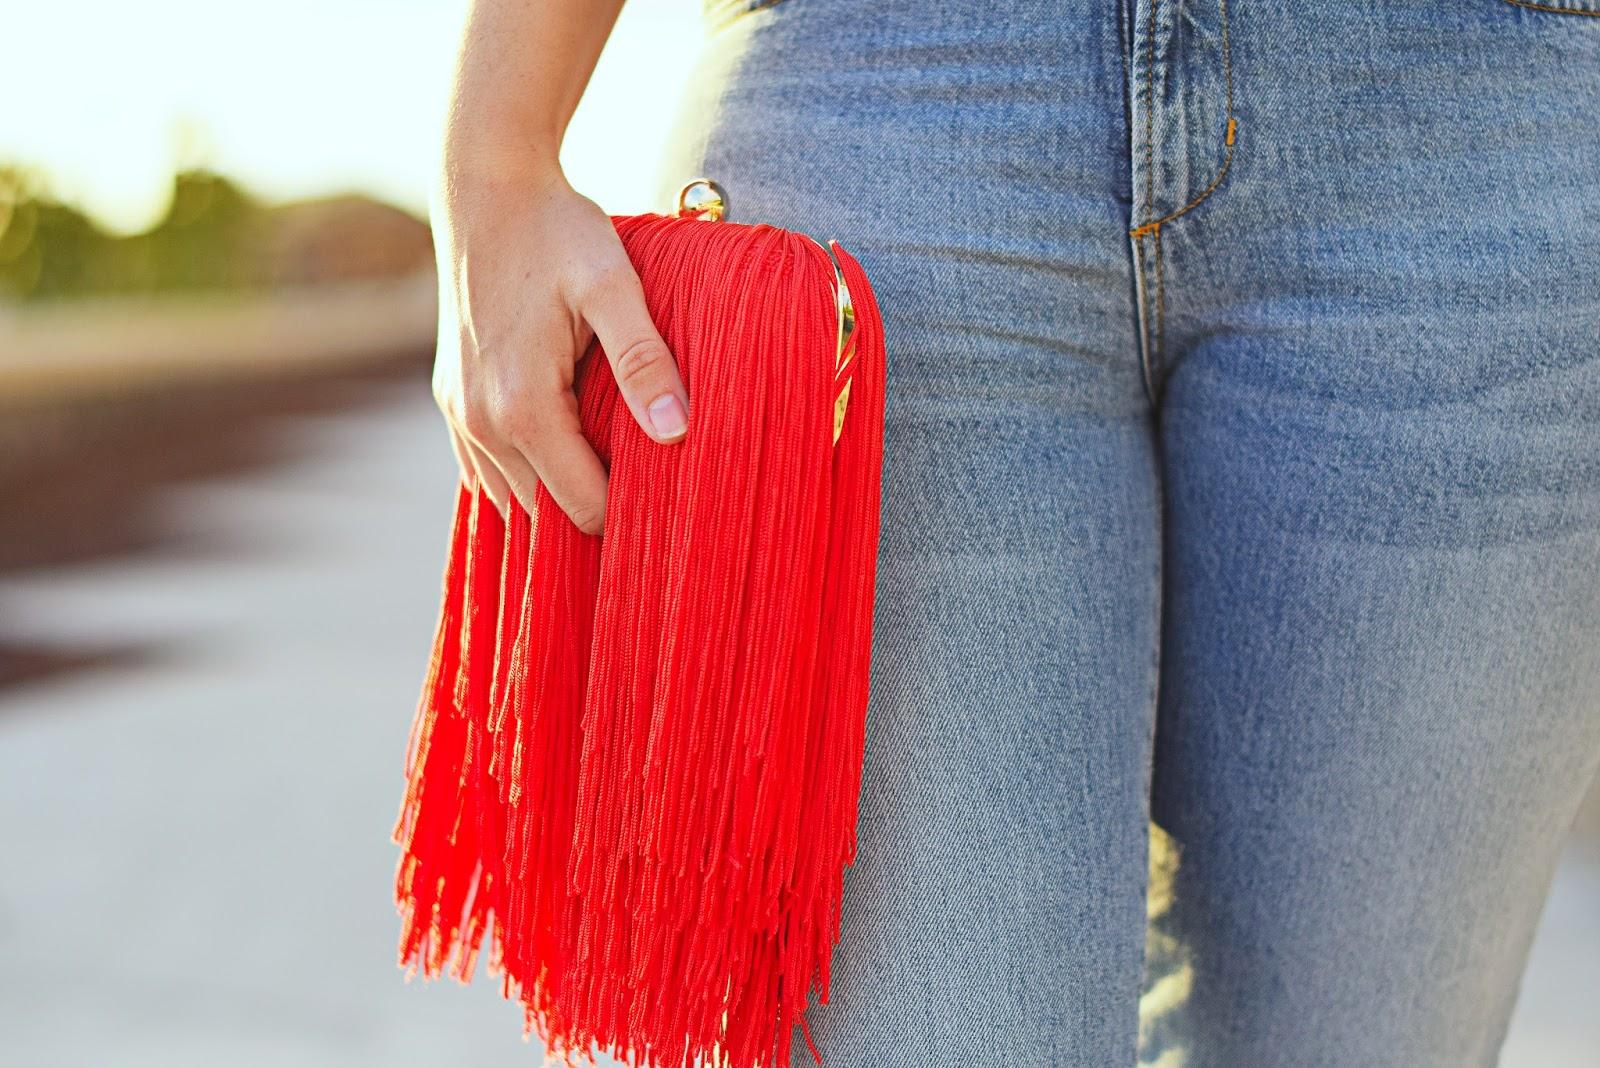 NERY HDEZ, Bolso de flecos, bolso rojo, blanco